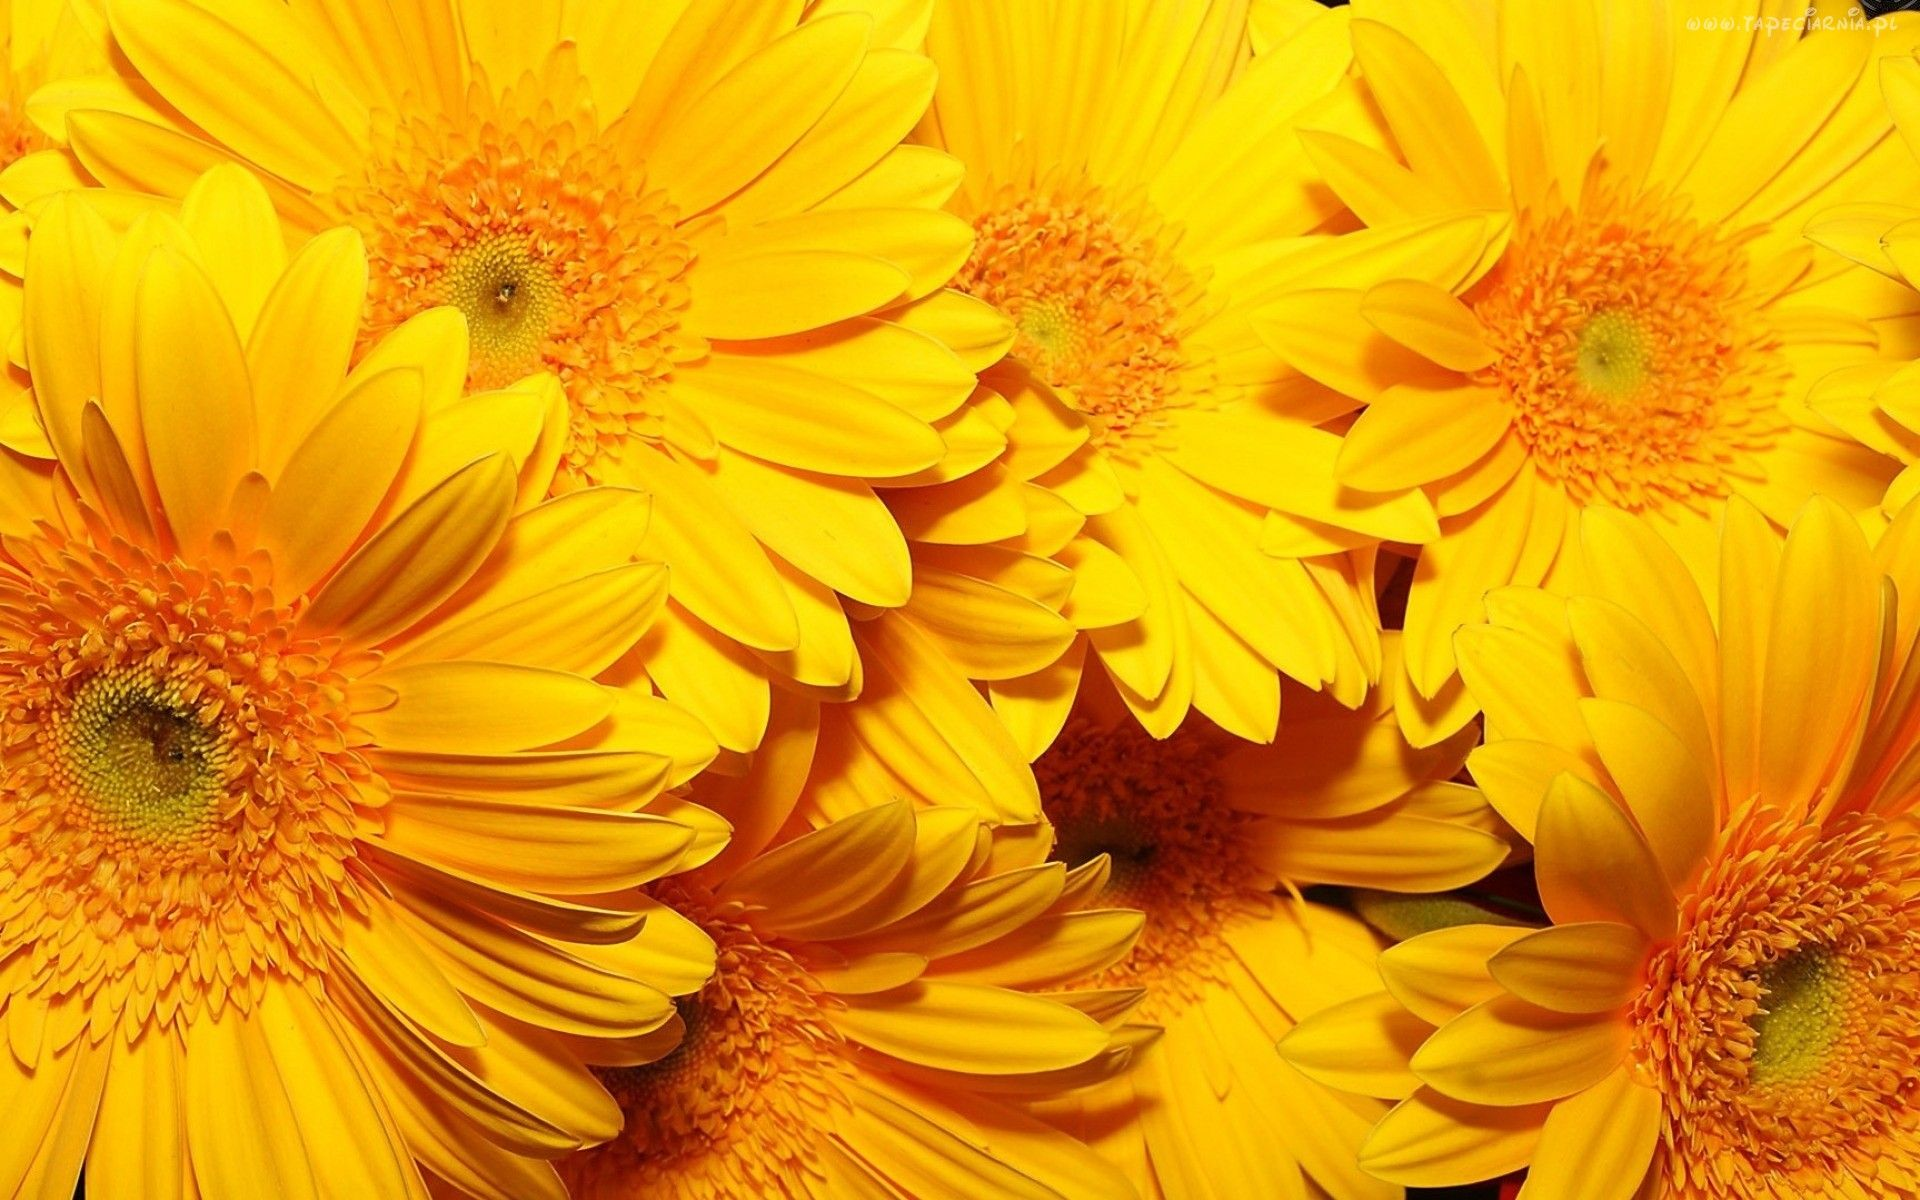 Edycja Tapety Zolte Kwiaty Gerbery Tapety Tapeta Zdjecia Tapety Na Pulpit Yellow Flower Wallpaper Yellow Flowers Yellow Aesthetic